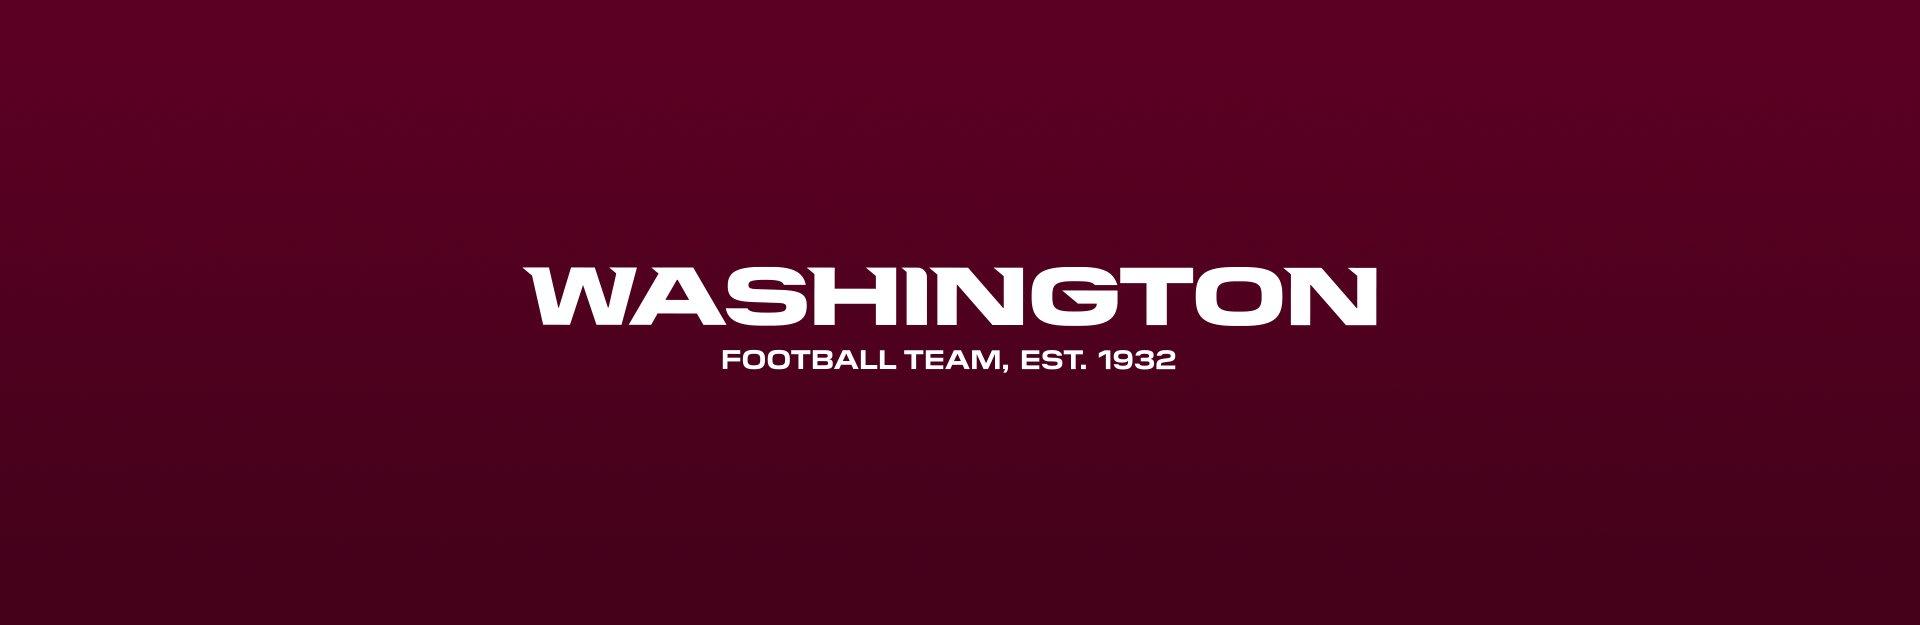 Washington Football Team logo on maroon background